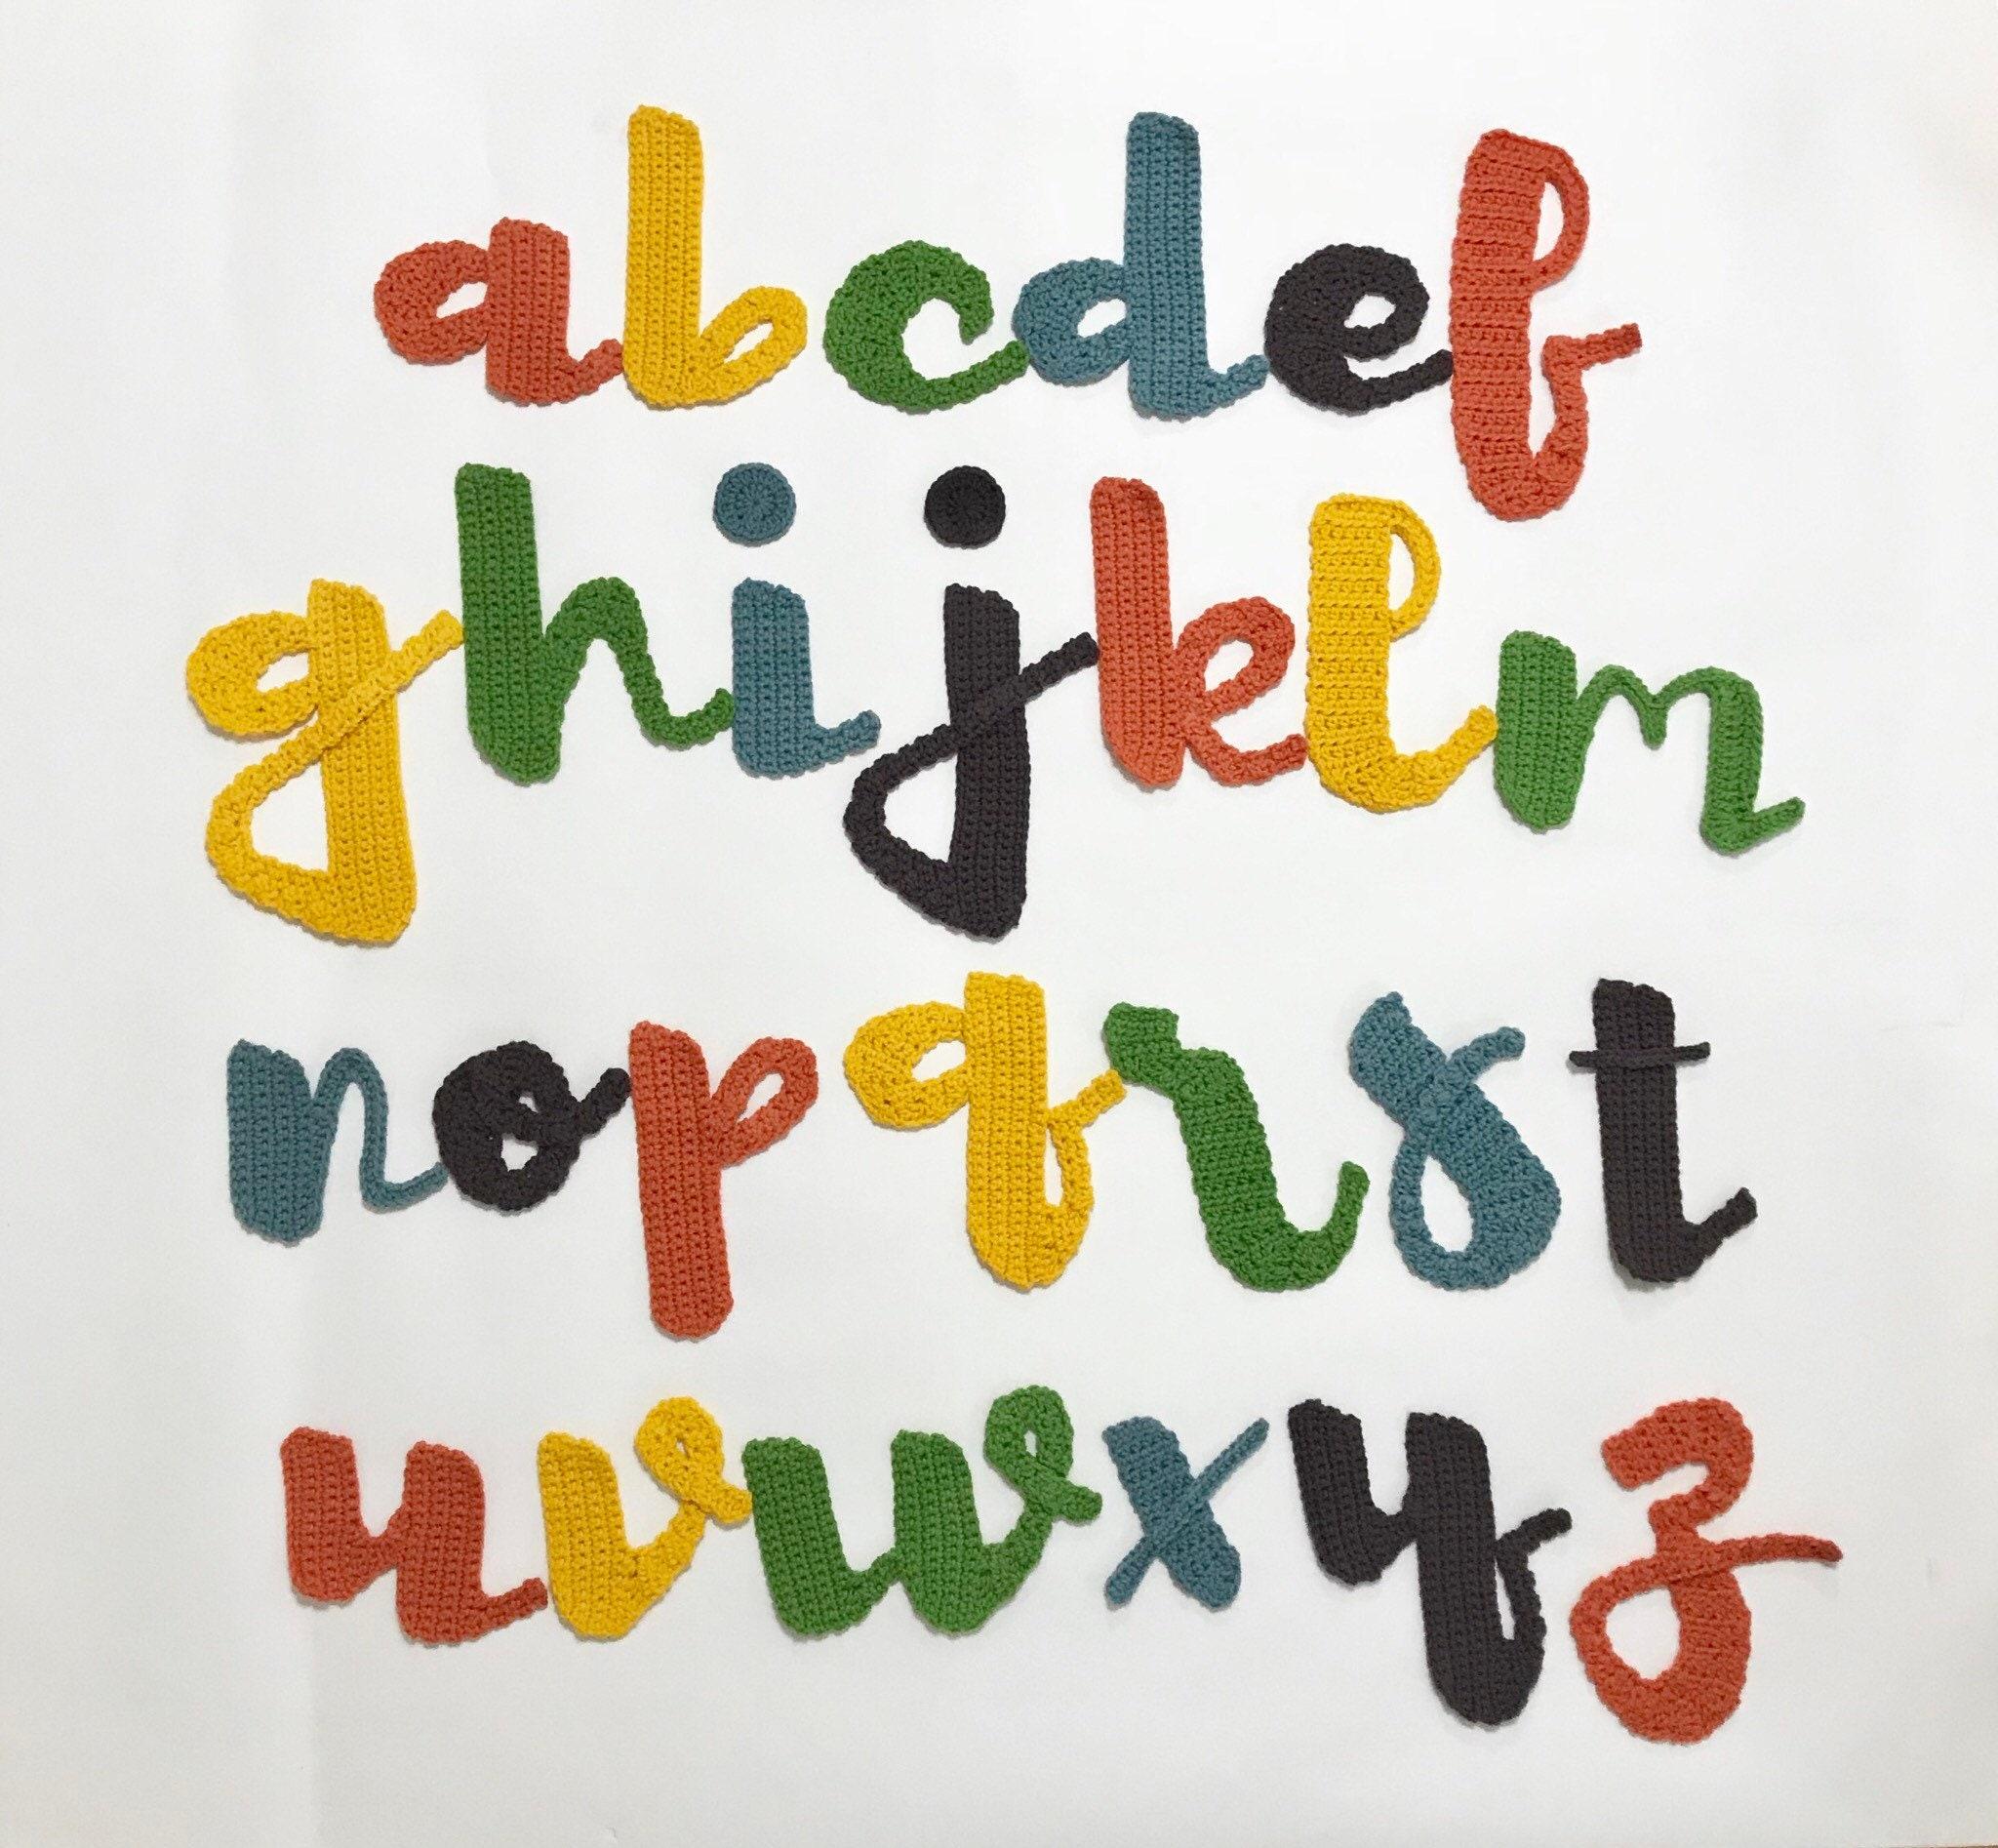 Angels Rainbows Font Crochet Alphabet Pattern Crochet Etsy